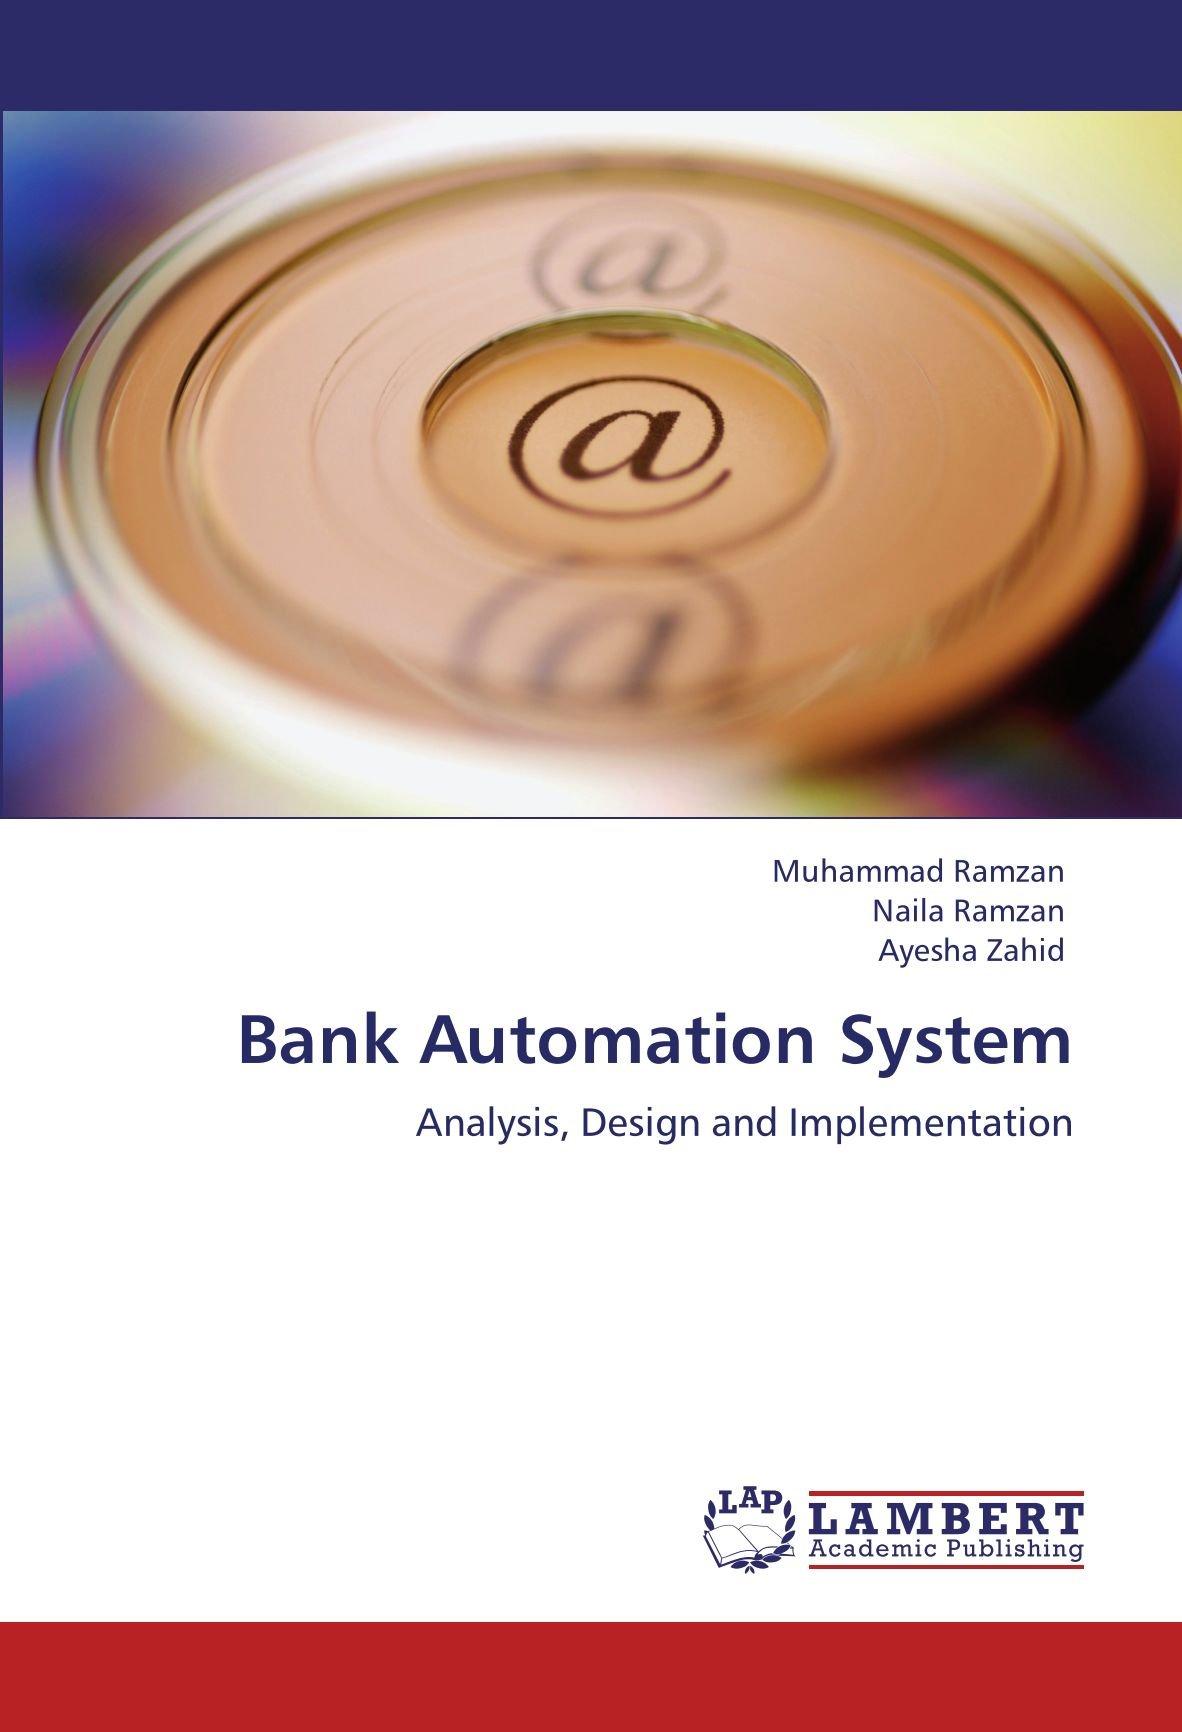 Amazon Com Bank Automation System Analysis Design And Implementation 9783848444090 Ramzan Muhammad Ramzan Naila Zahid Ayesha Books